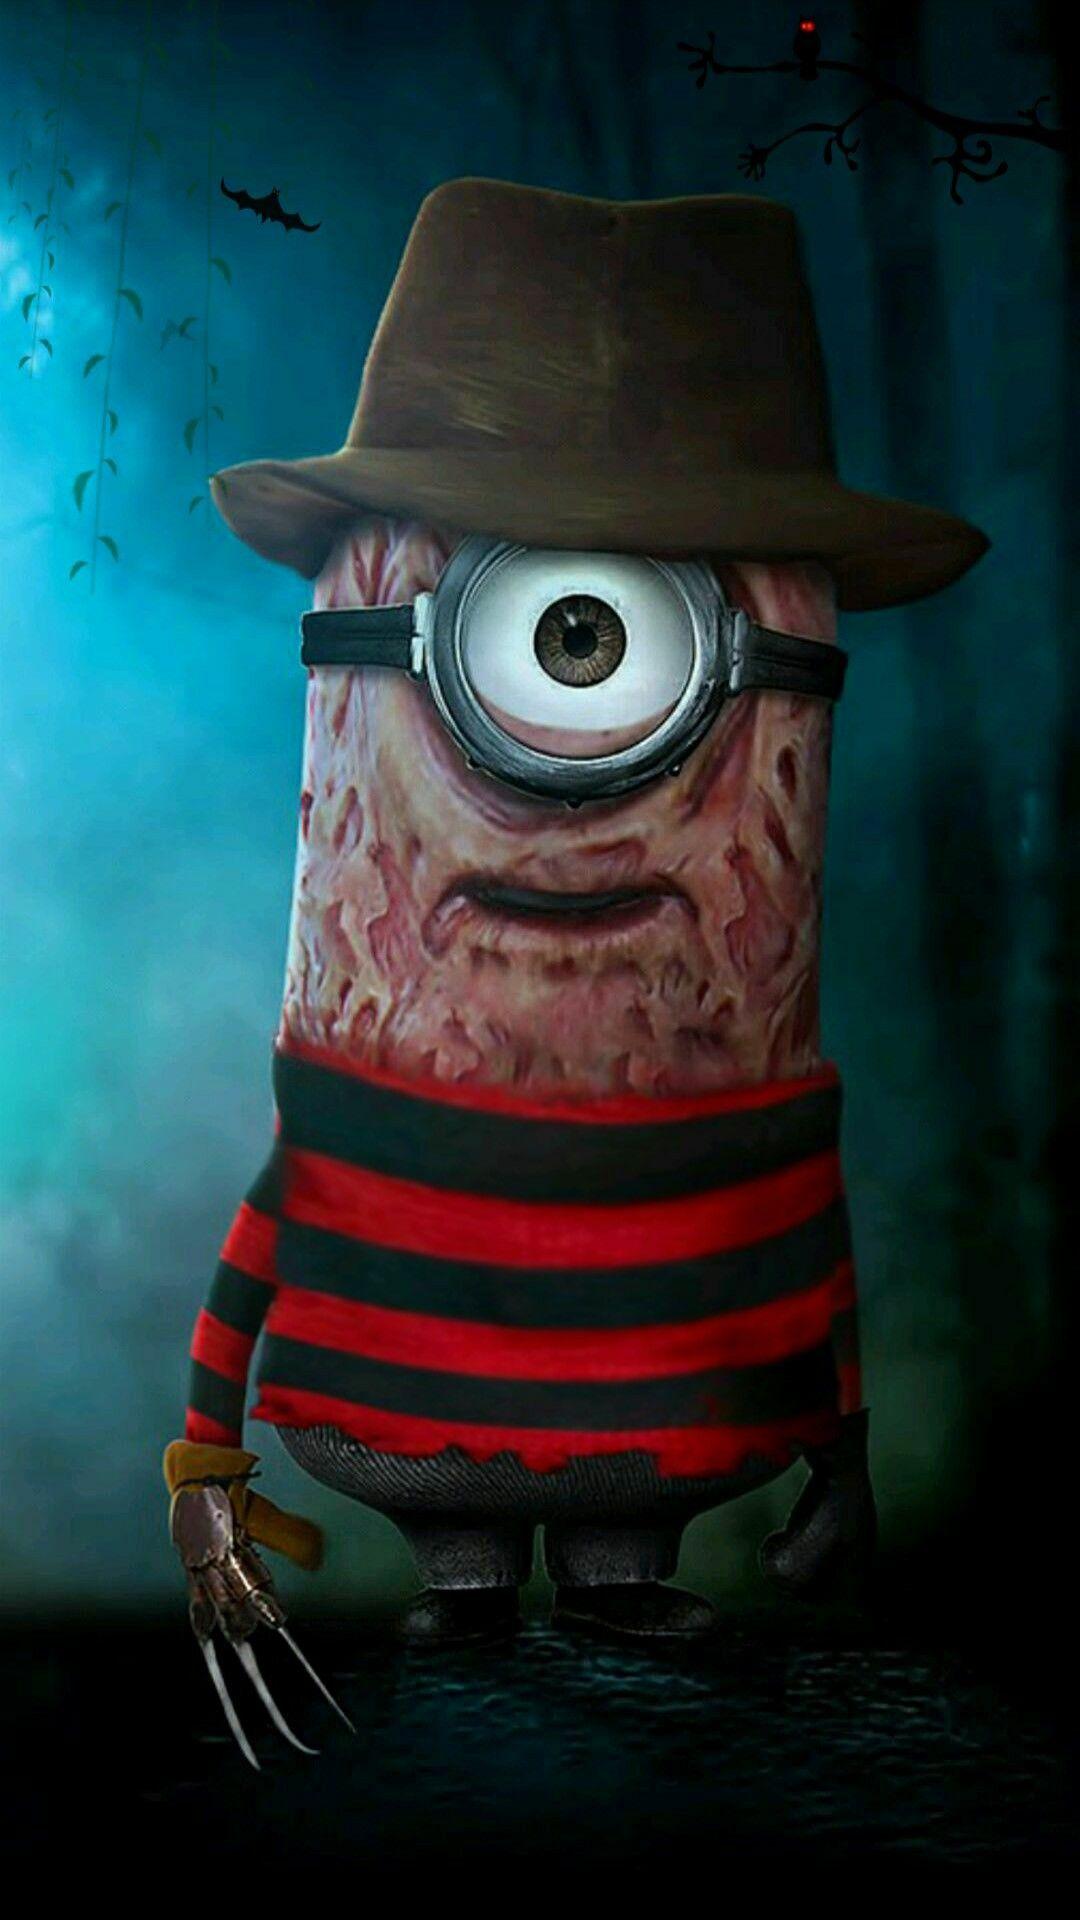 Freddy Minion Horror photos, Halloween wallpaper, Funny